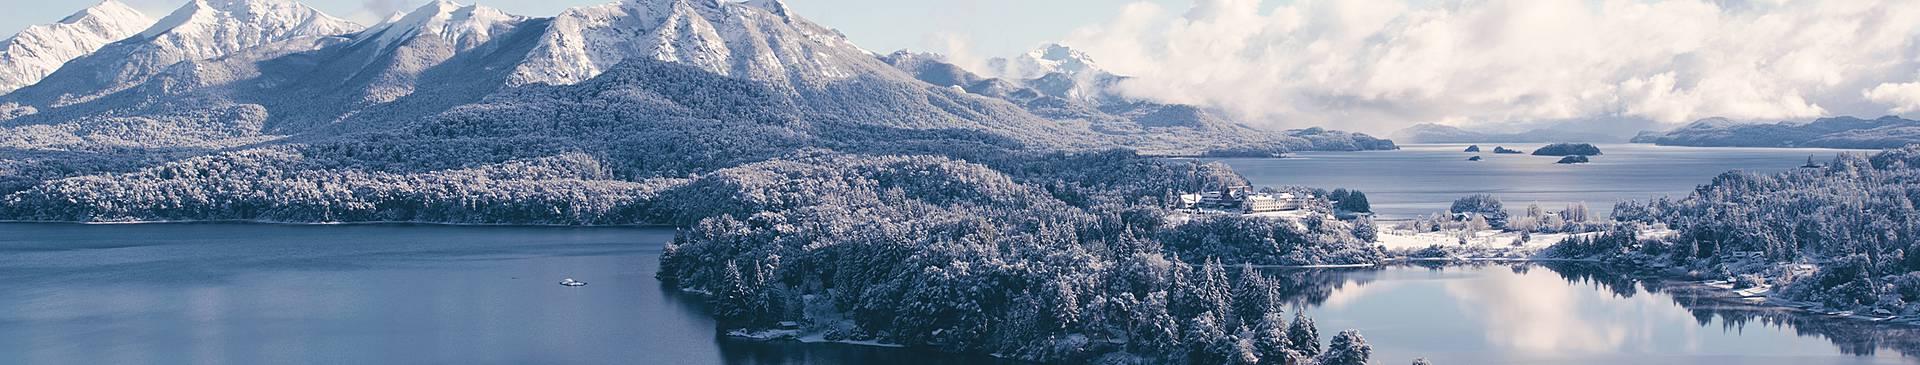 Winter in Argentina